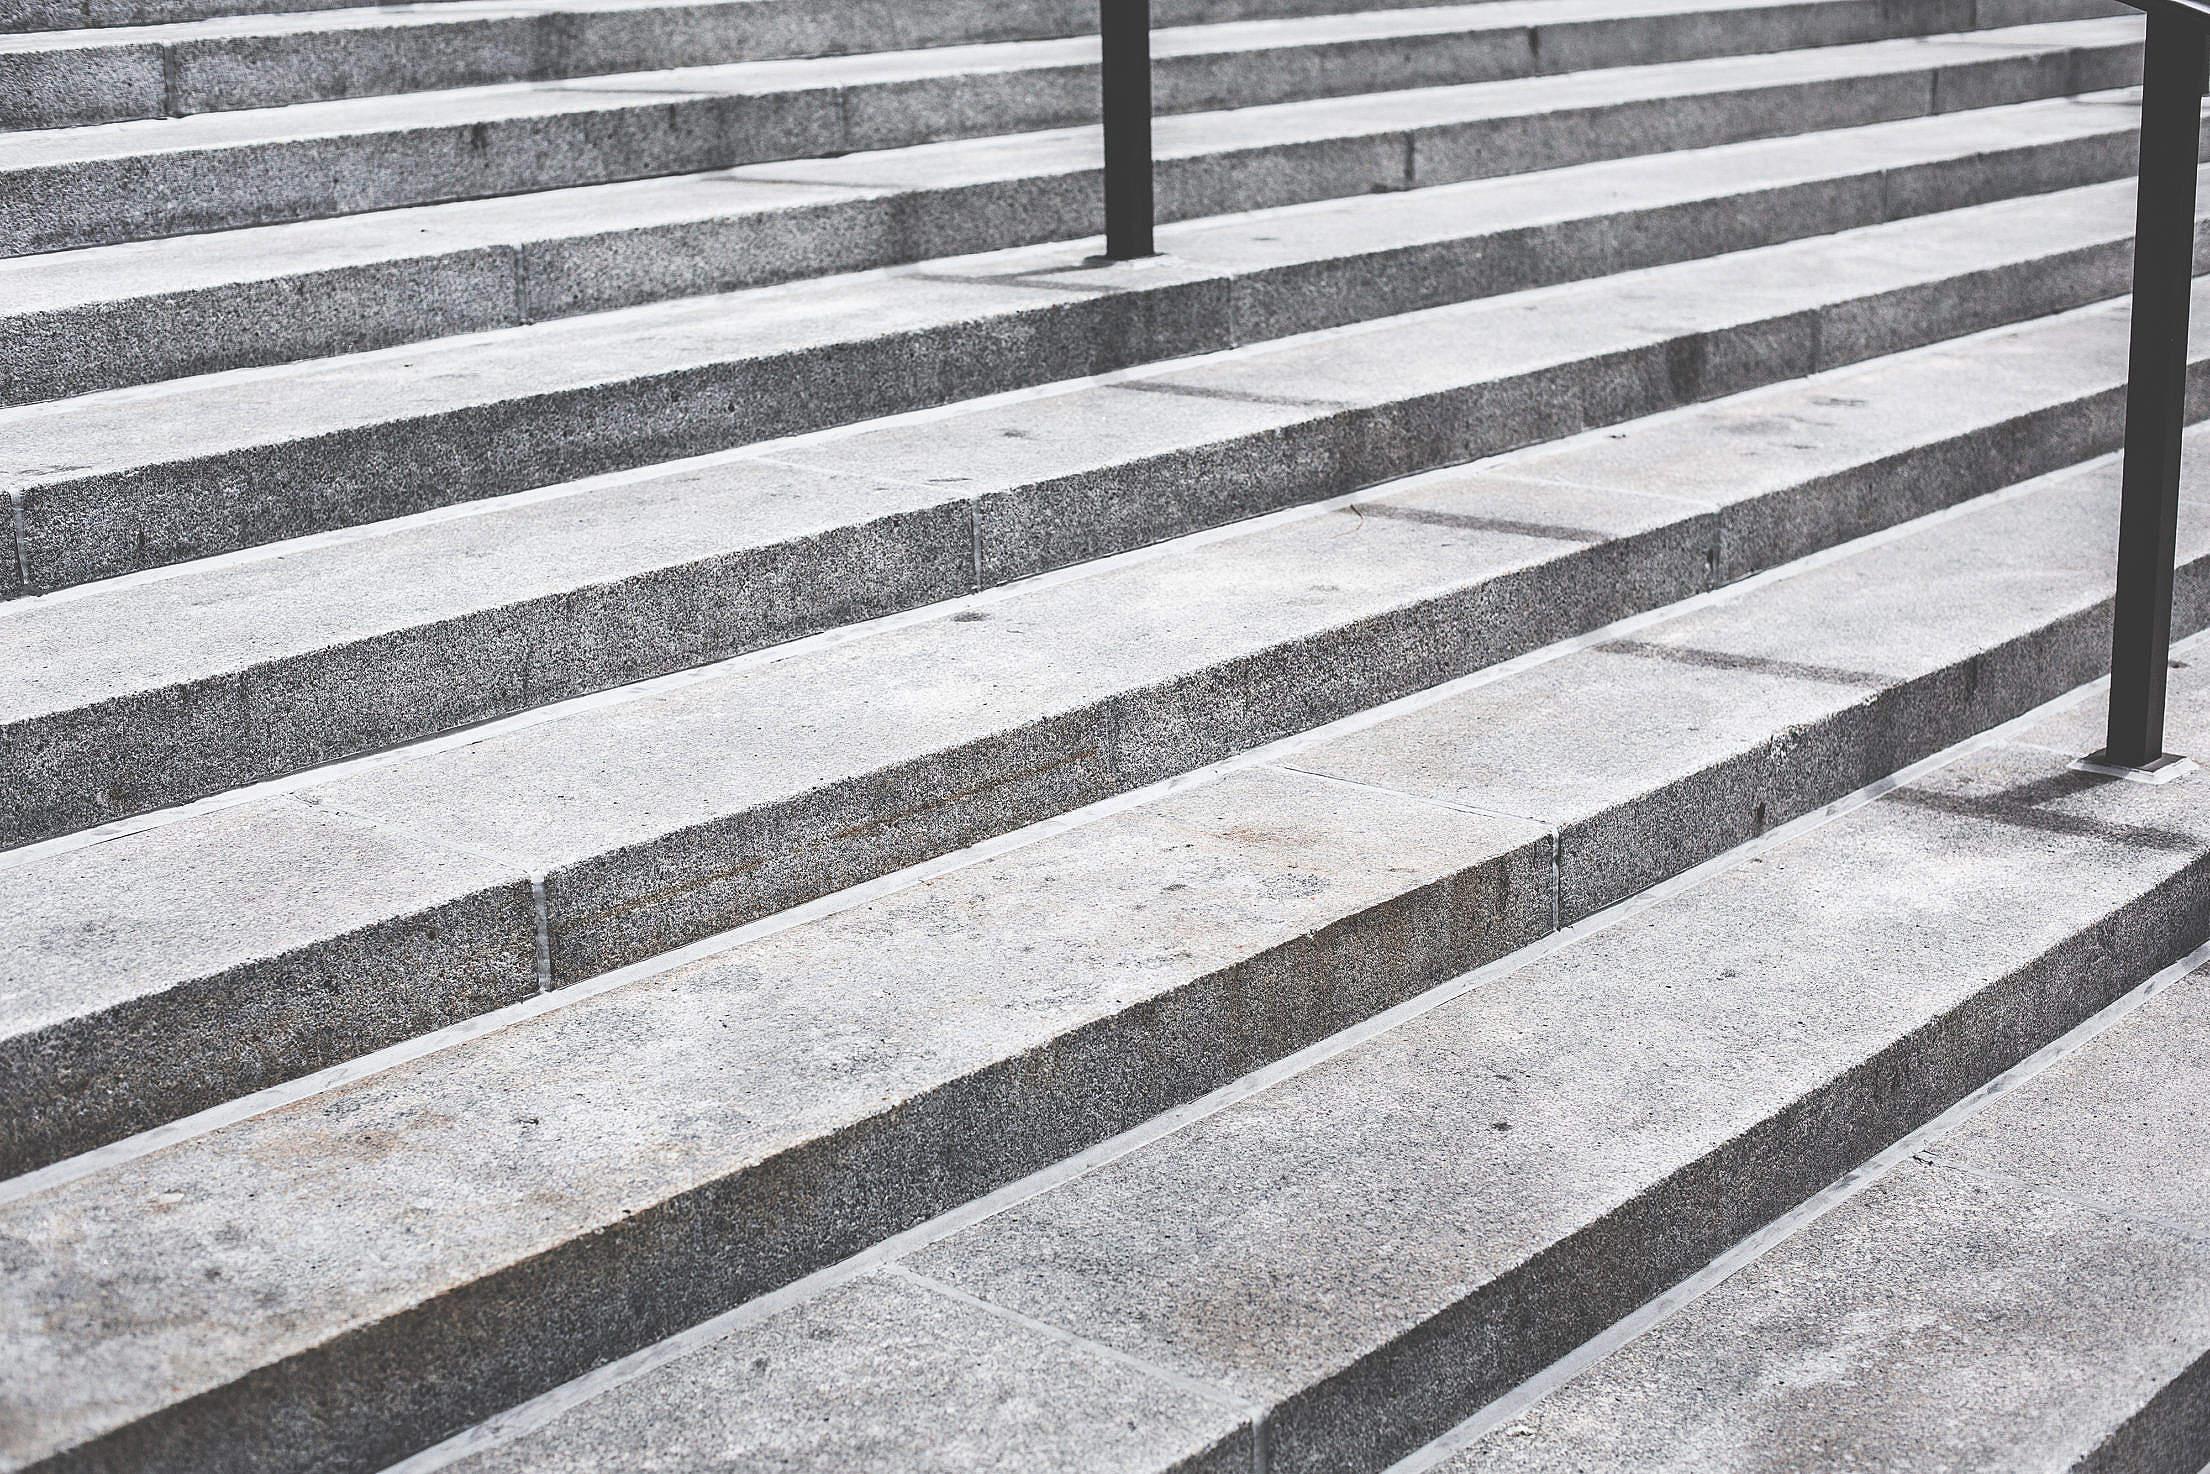 Gray Concrete Stairs Free Stock Photo